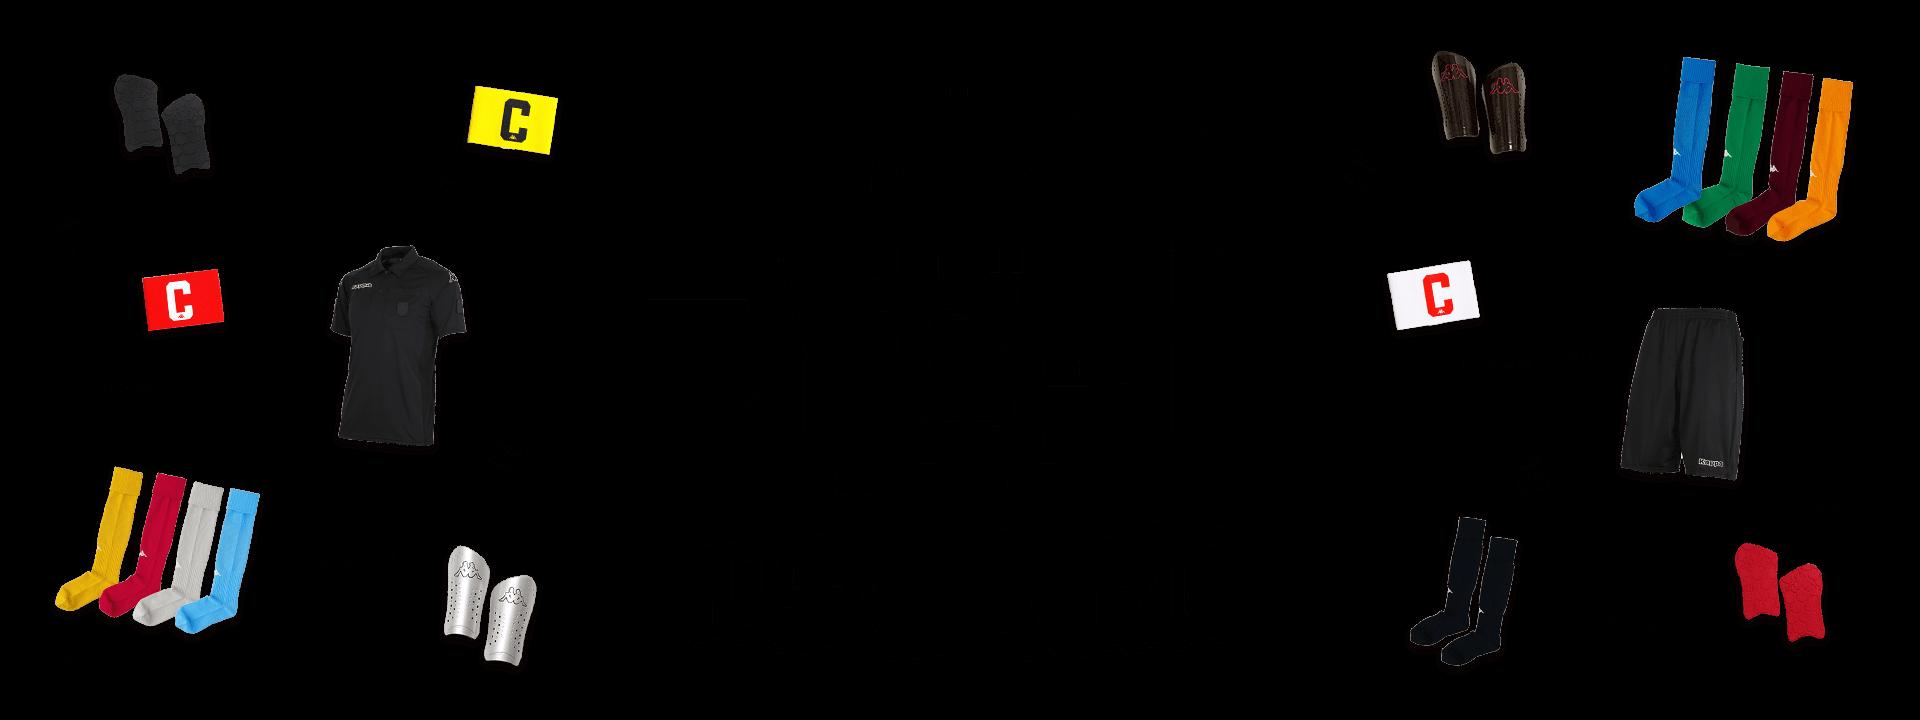 kappaキャンペーン